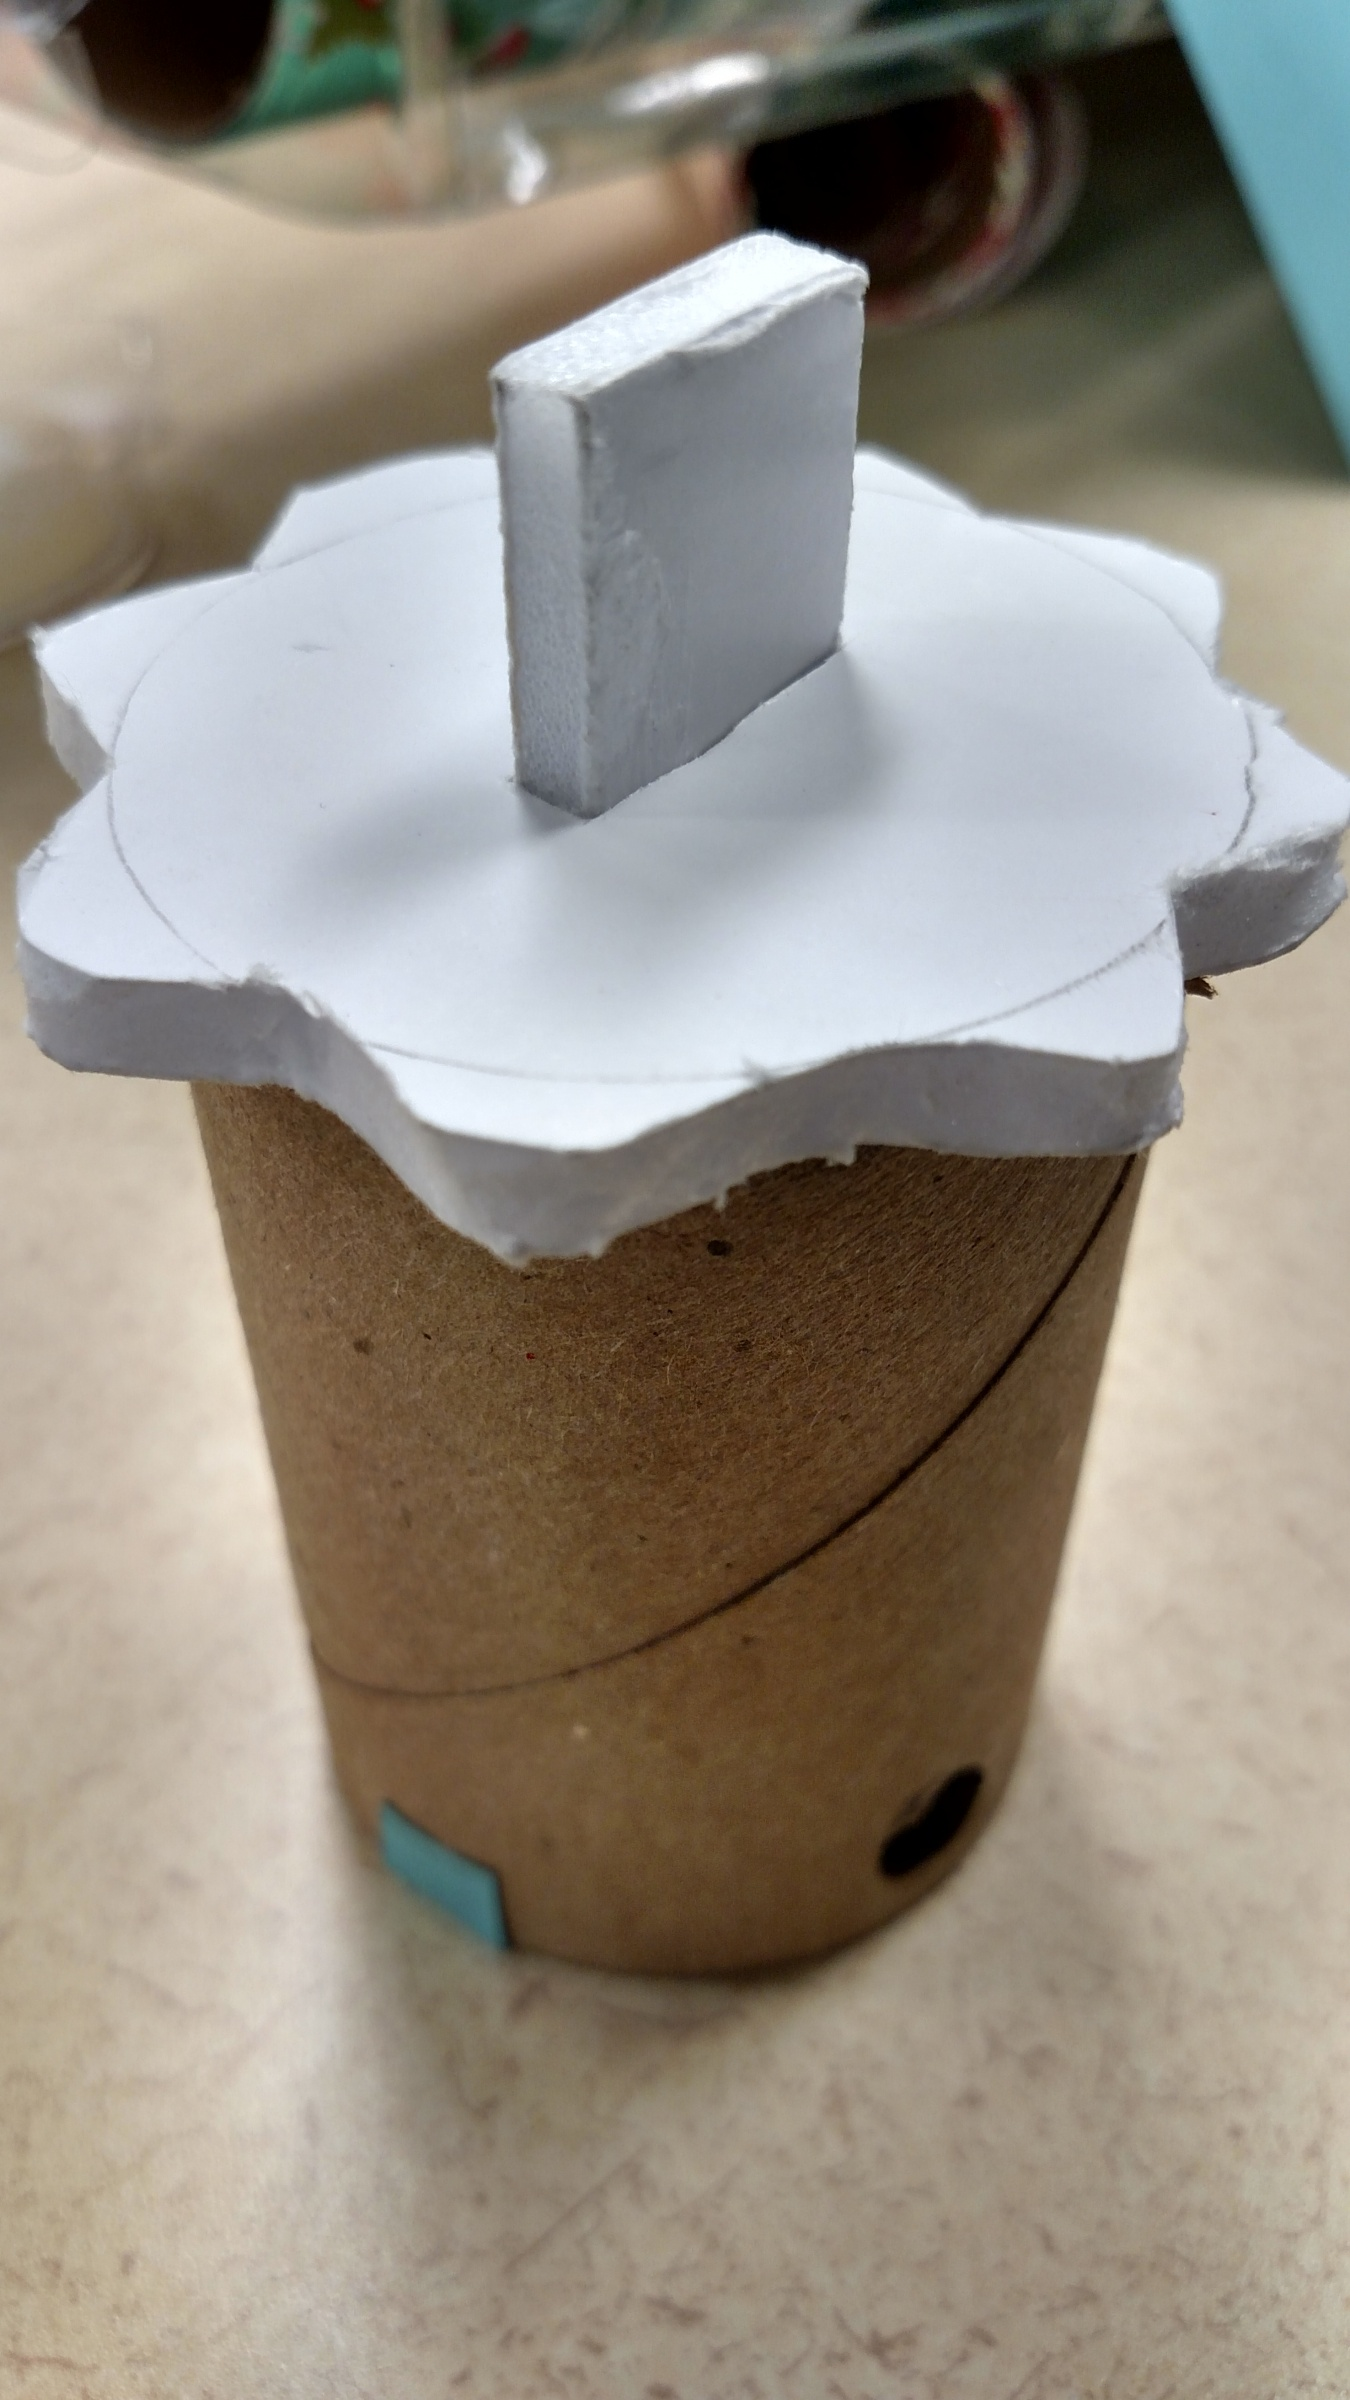 Toothpaste pellets dispenser prototype